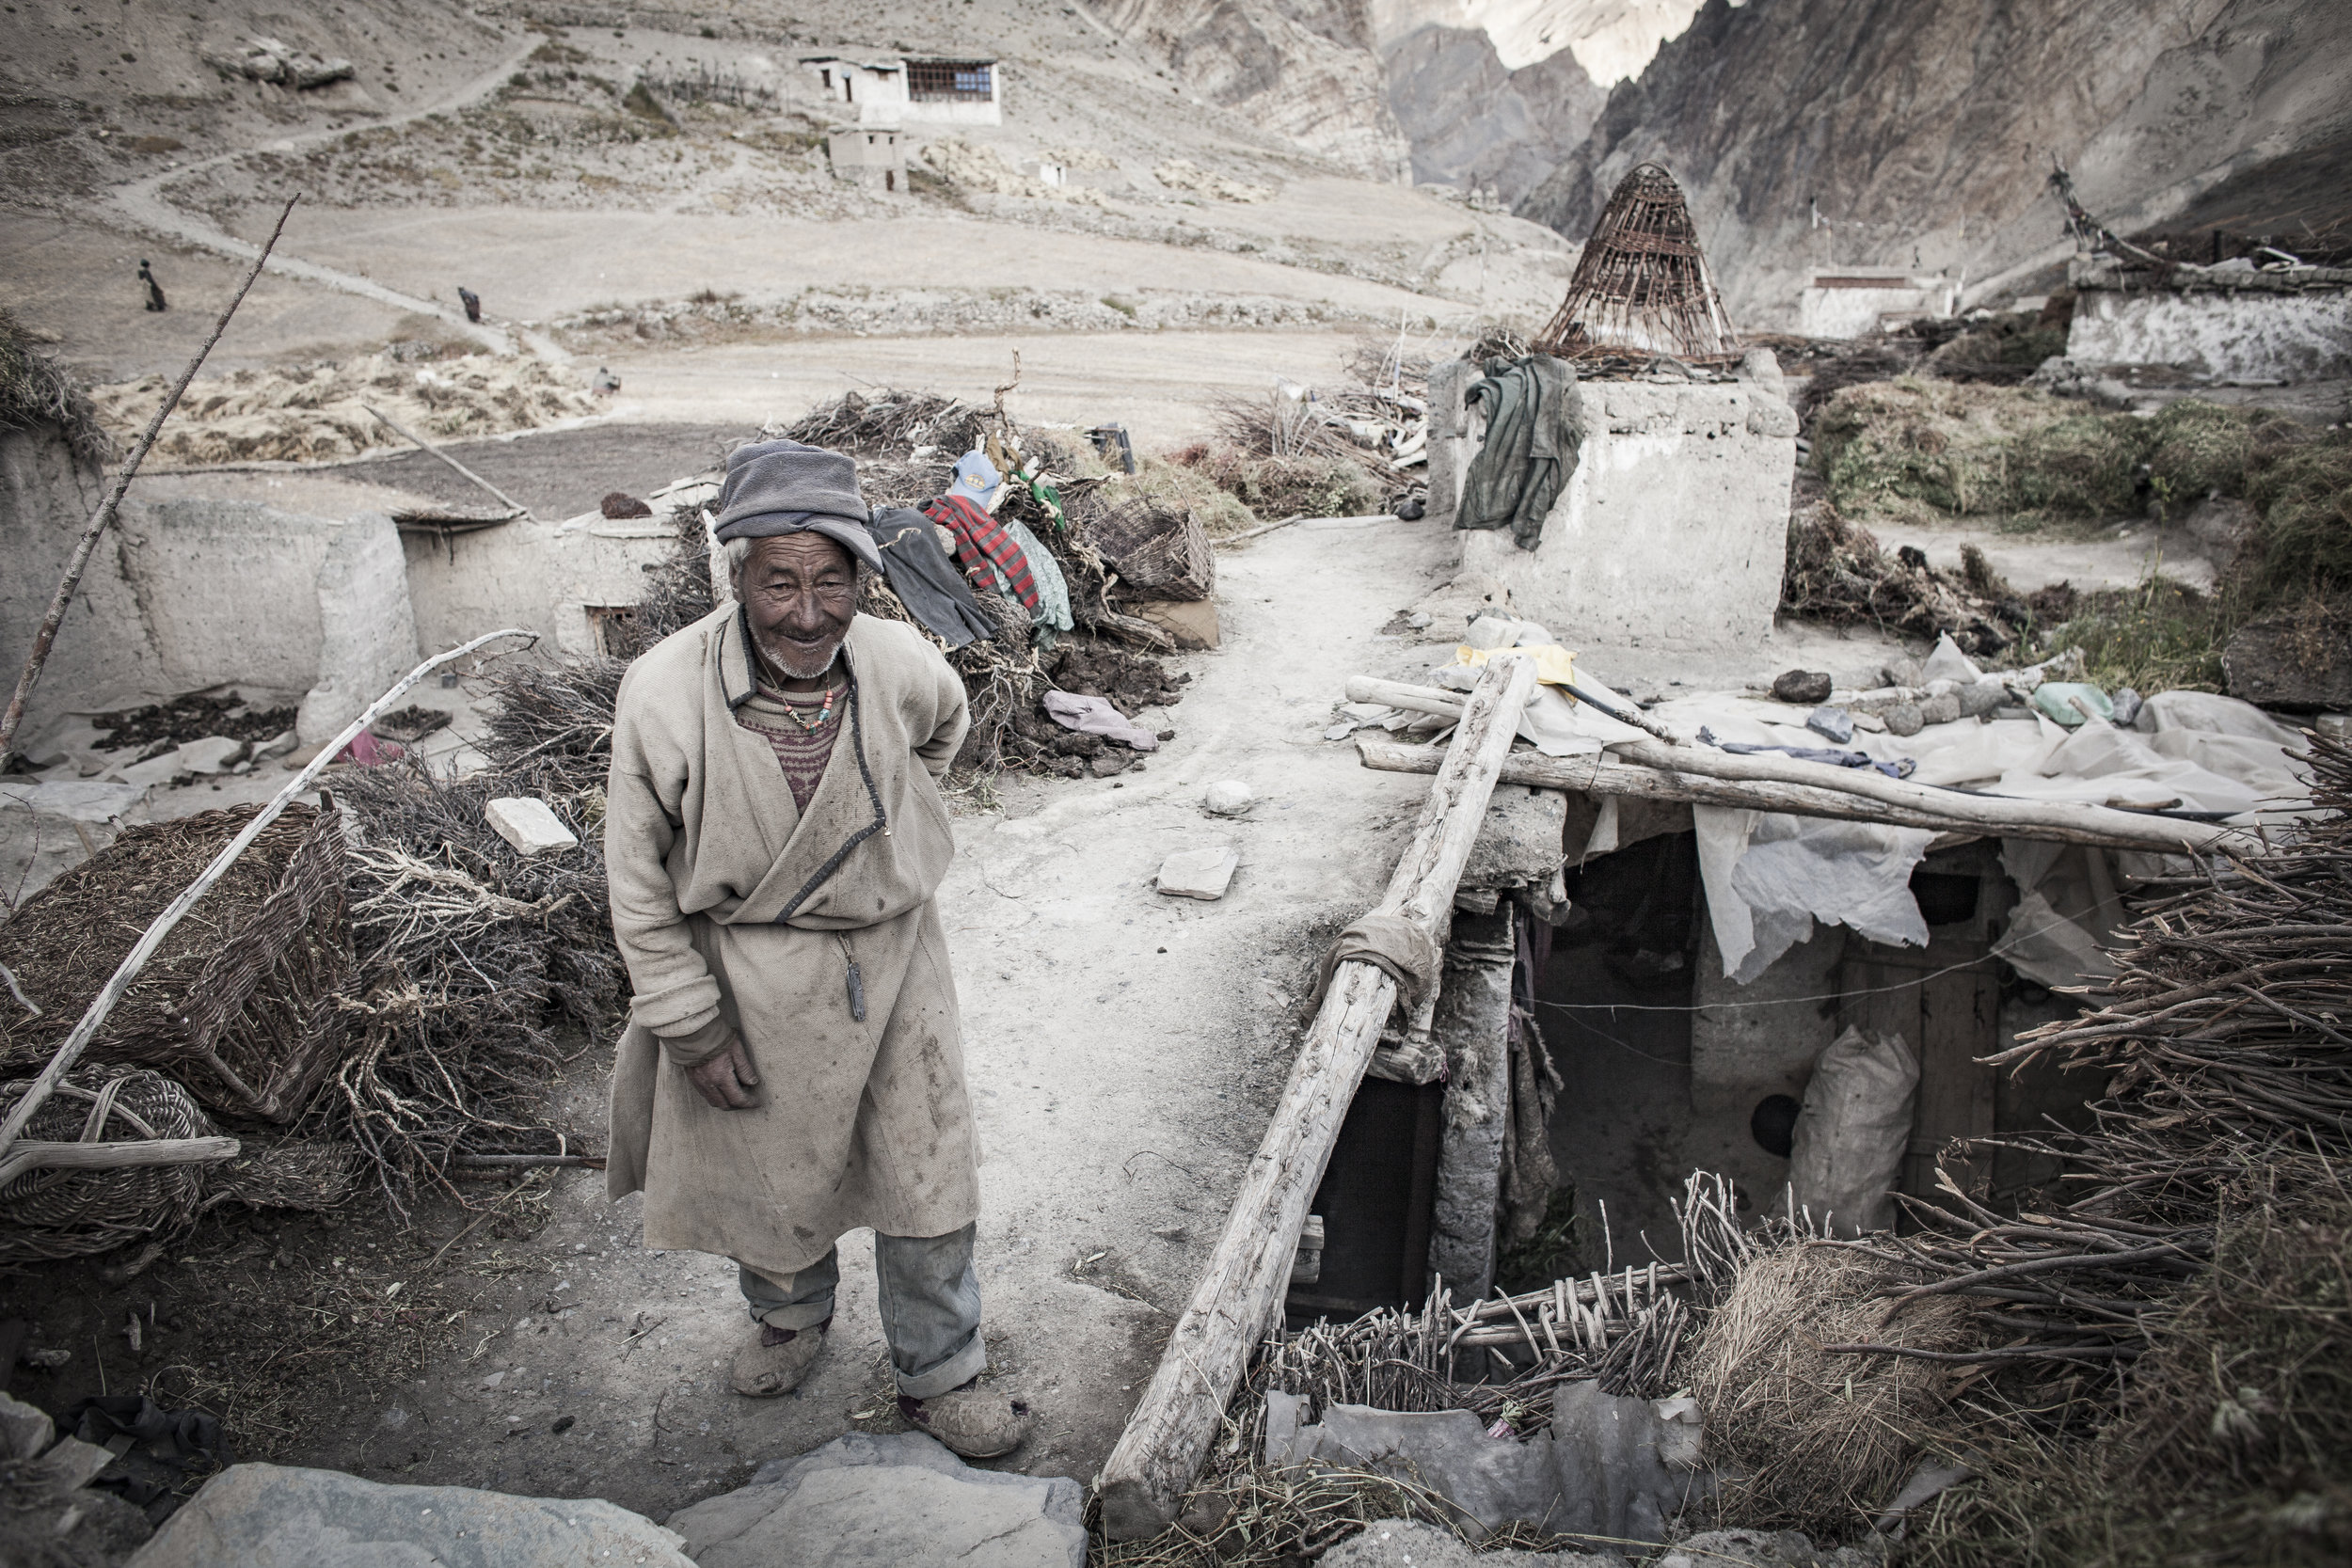 Gaudenz Danuser, Photoskar, Ladakh India IMG_2453.jpg